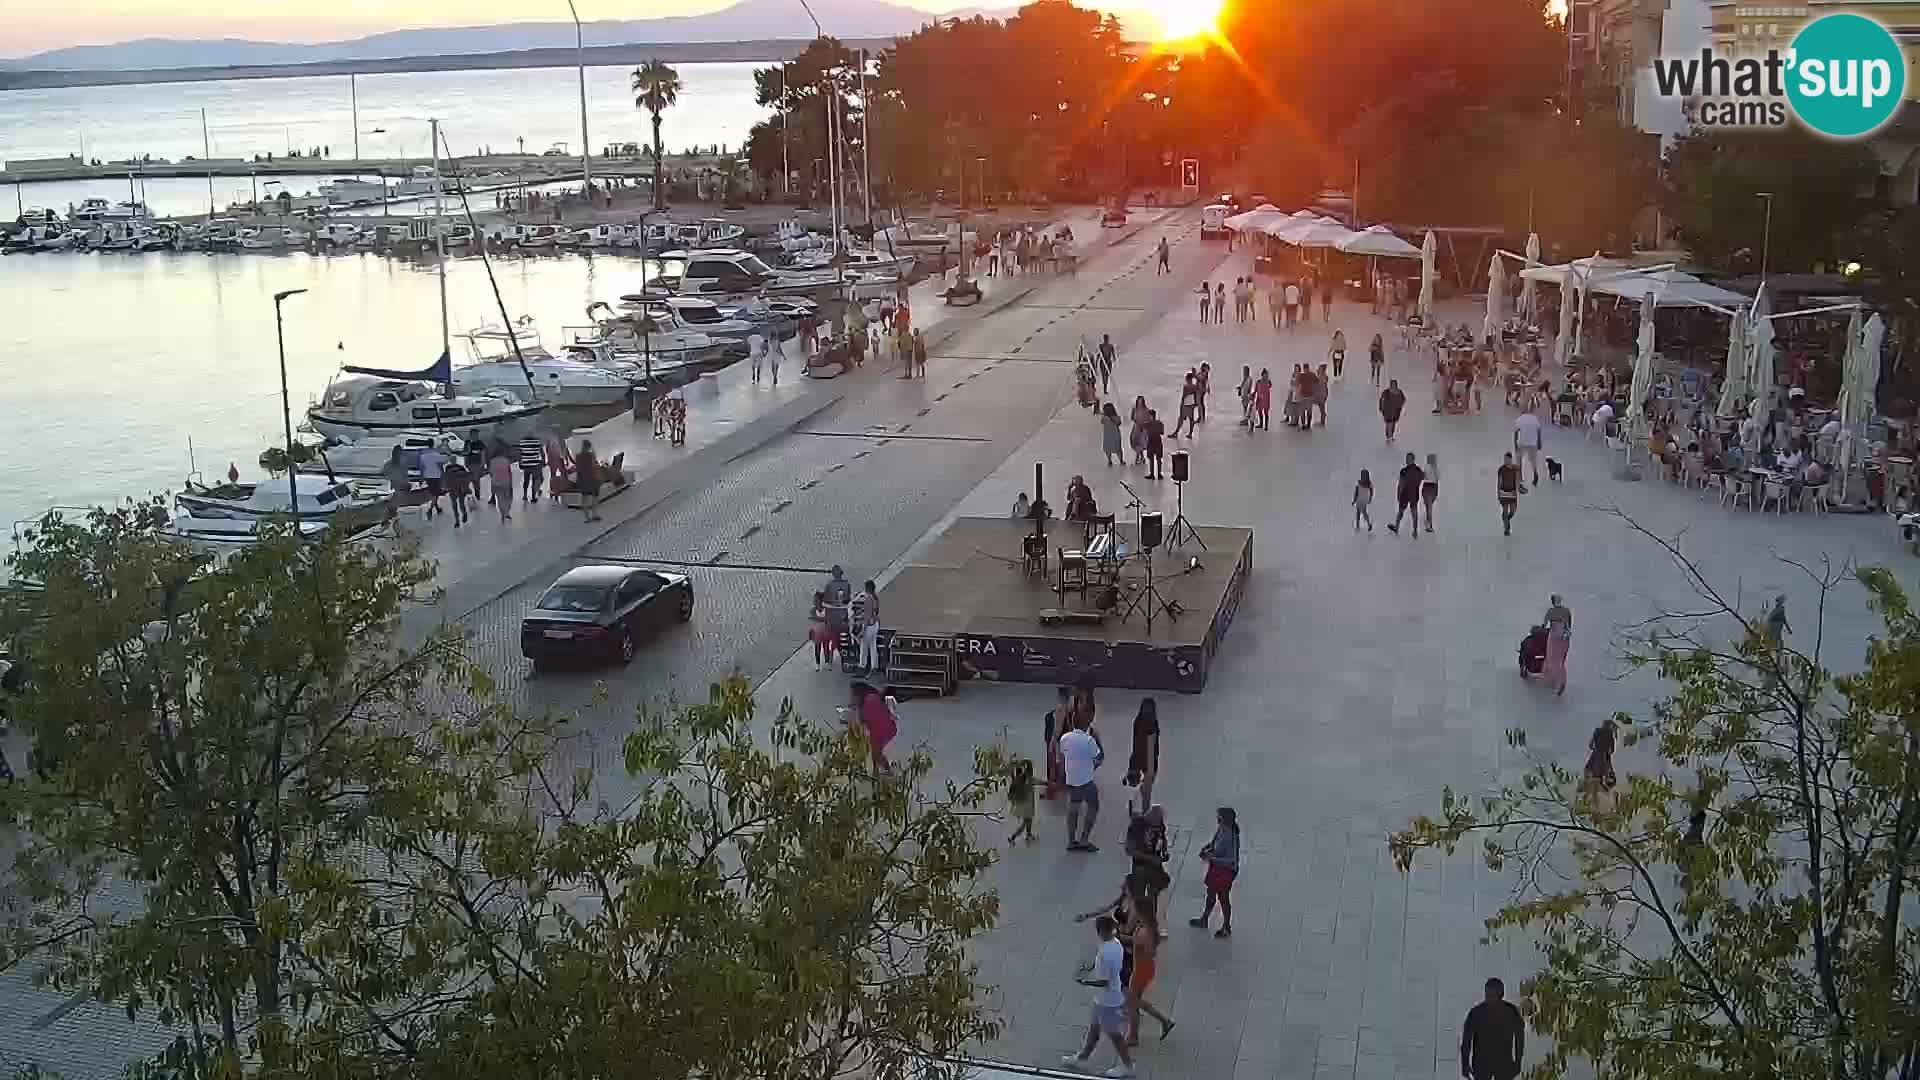 Crikvenica – Piazza Stjepan Radić